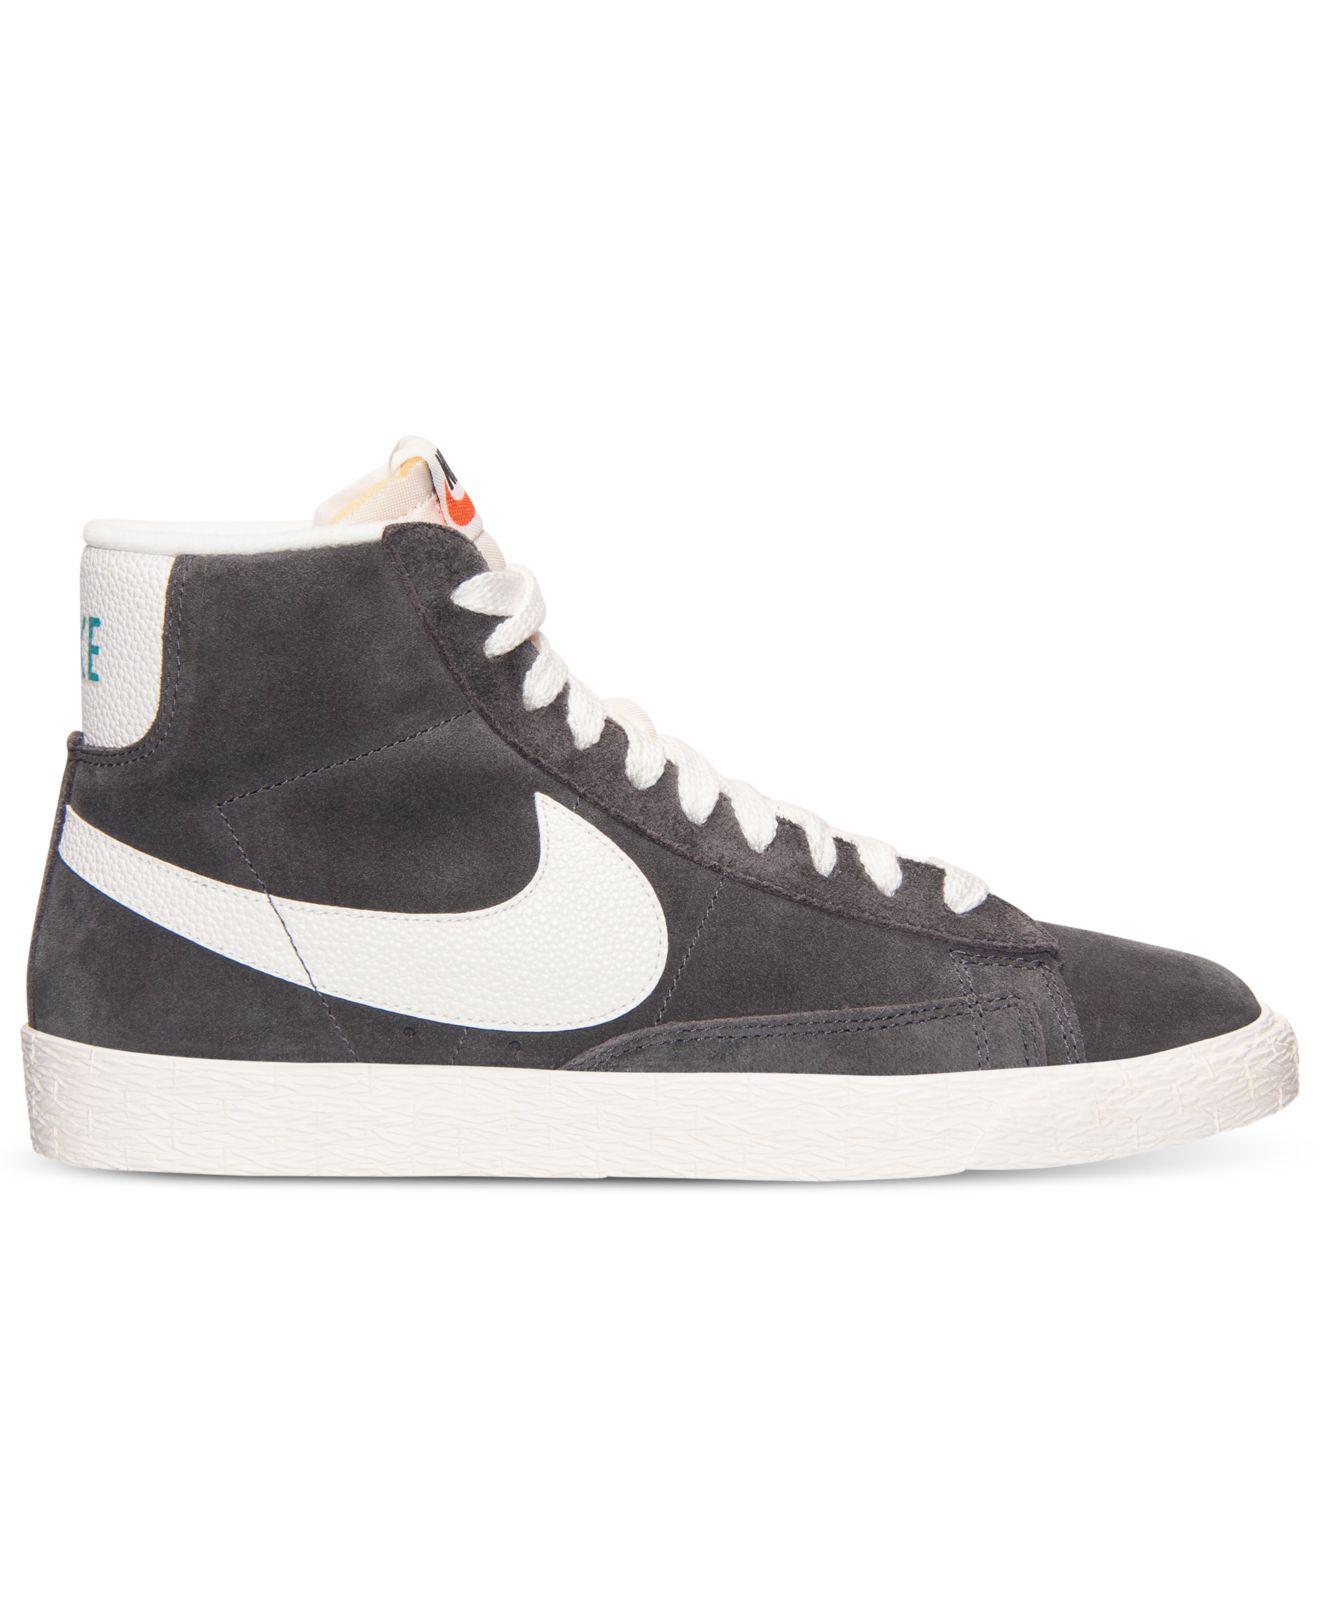 Nike WMNS Blazer Mid Suede Sneakers Black White